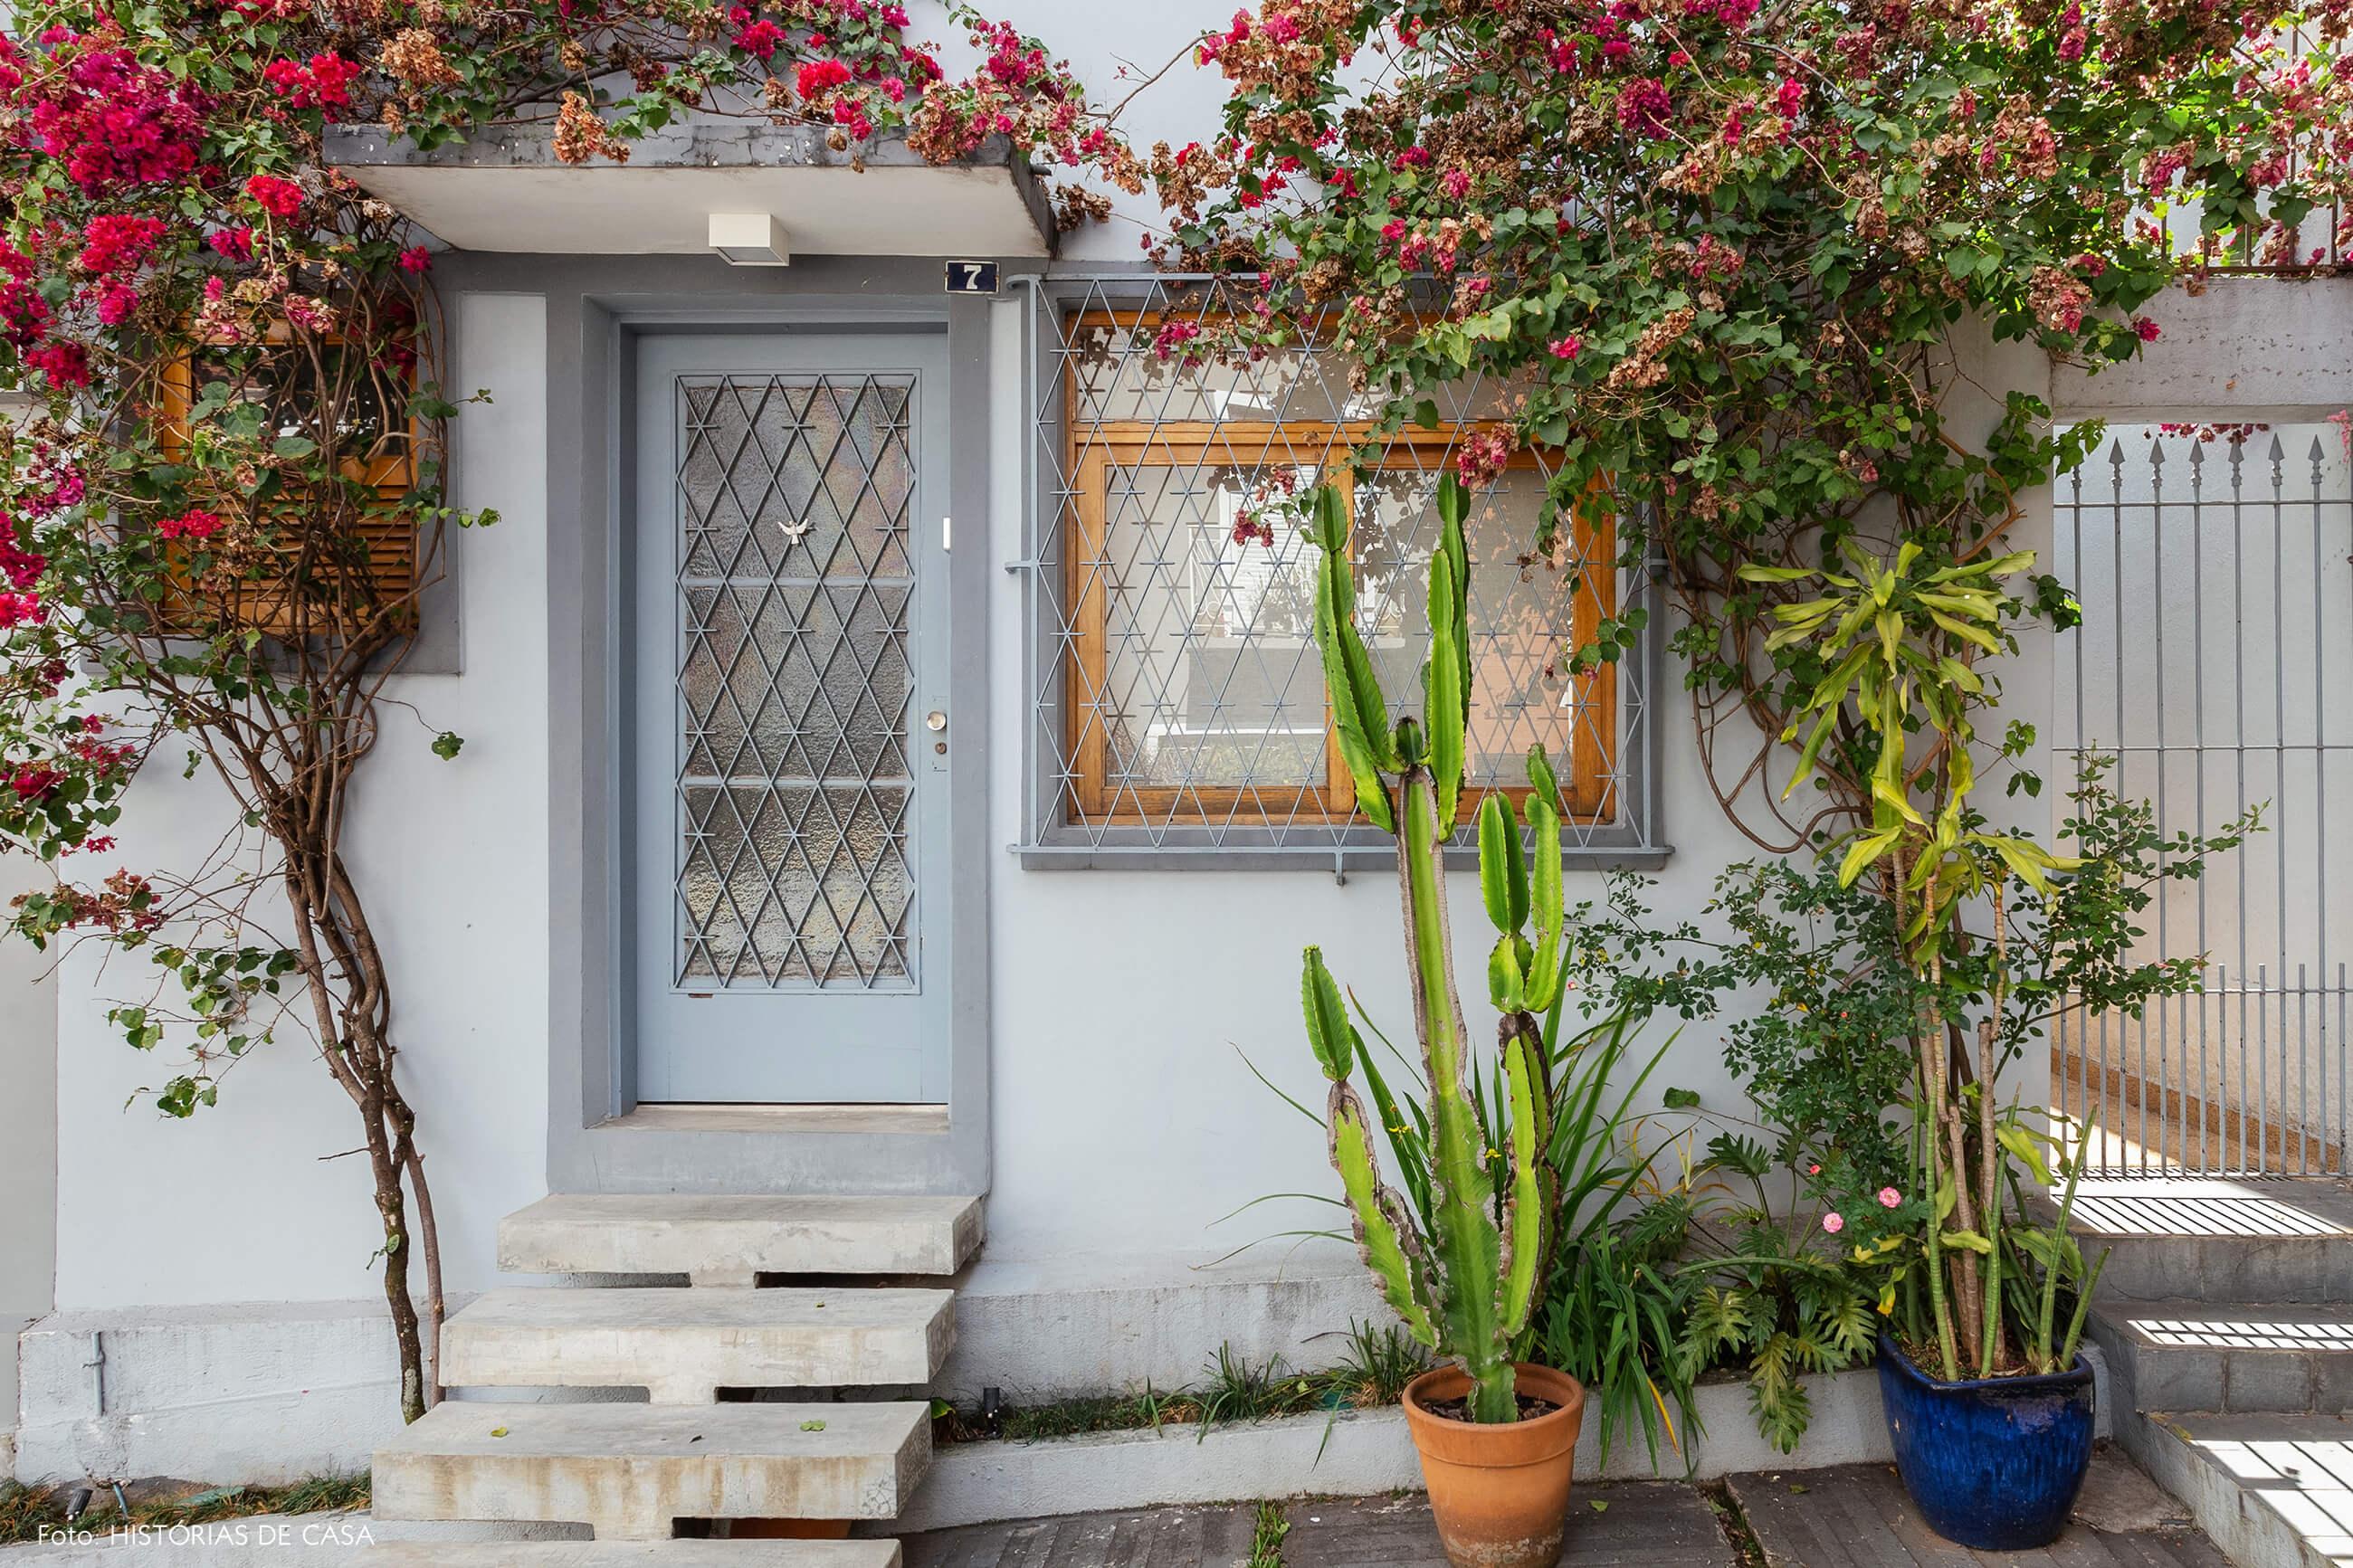 Casa de vila com fachada antiga pintada de cinza